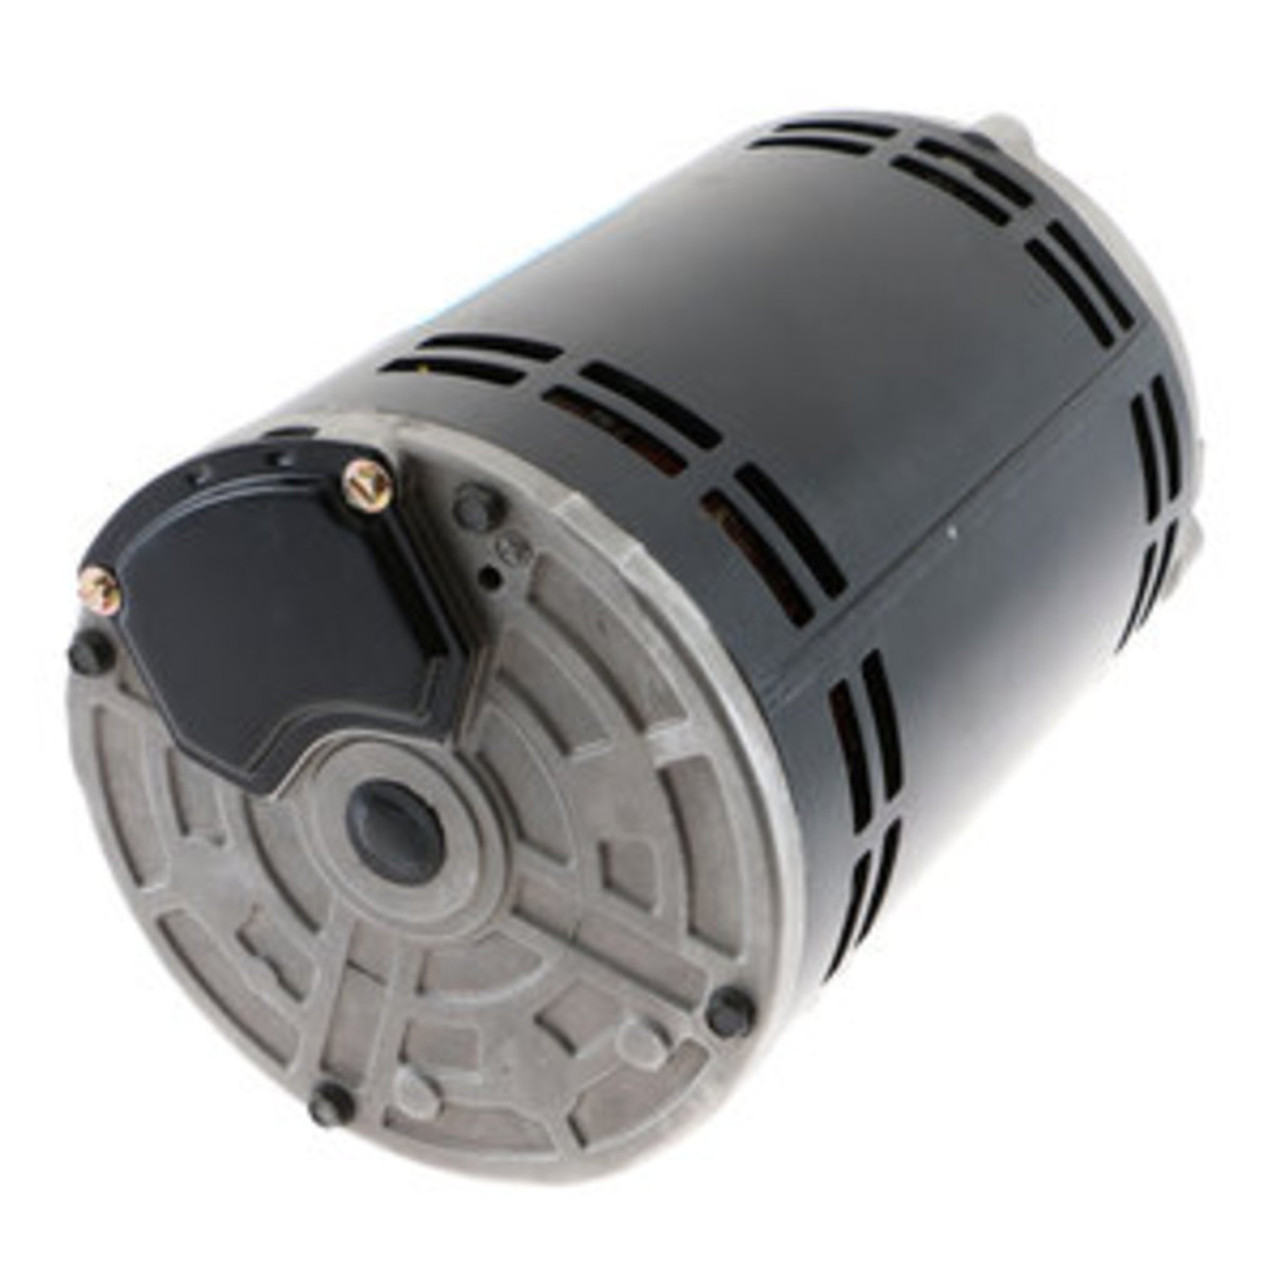 TorRey - ST295PE & ST295AI - Motor - 1.5HP 110 Volt - 05-71891